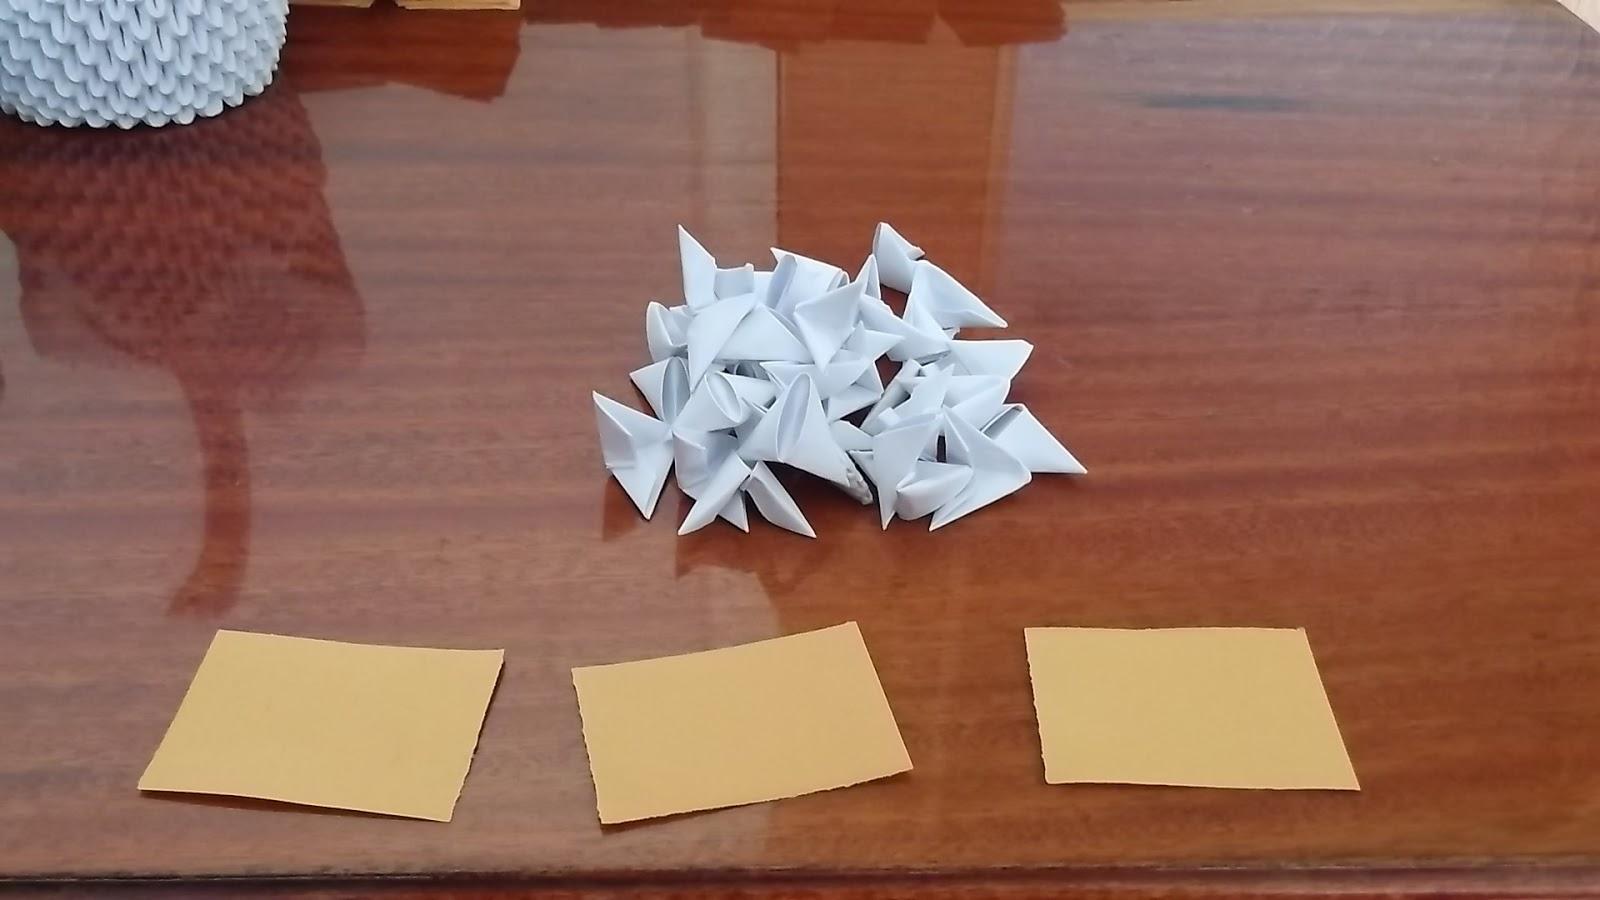 Razcapapercraft: 3D Origami Swan - photo#35